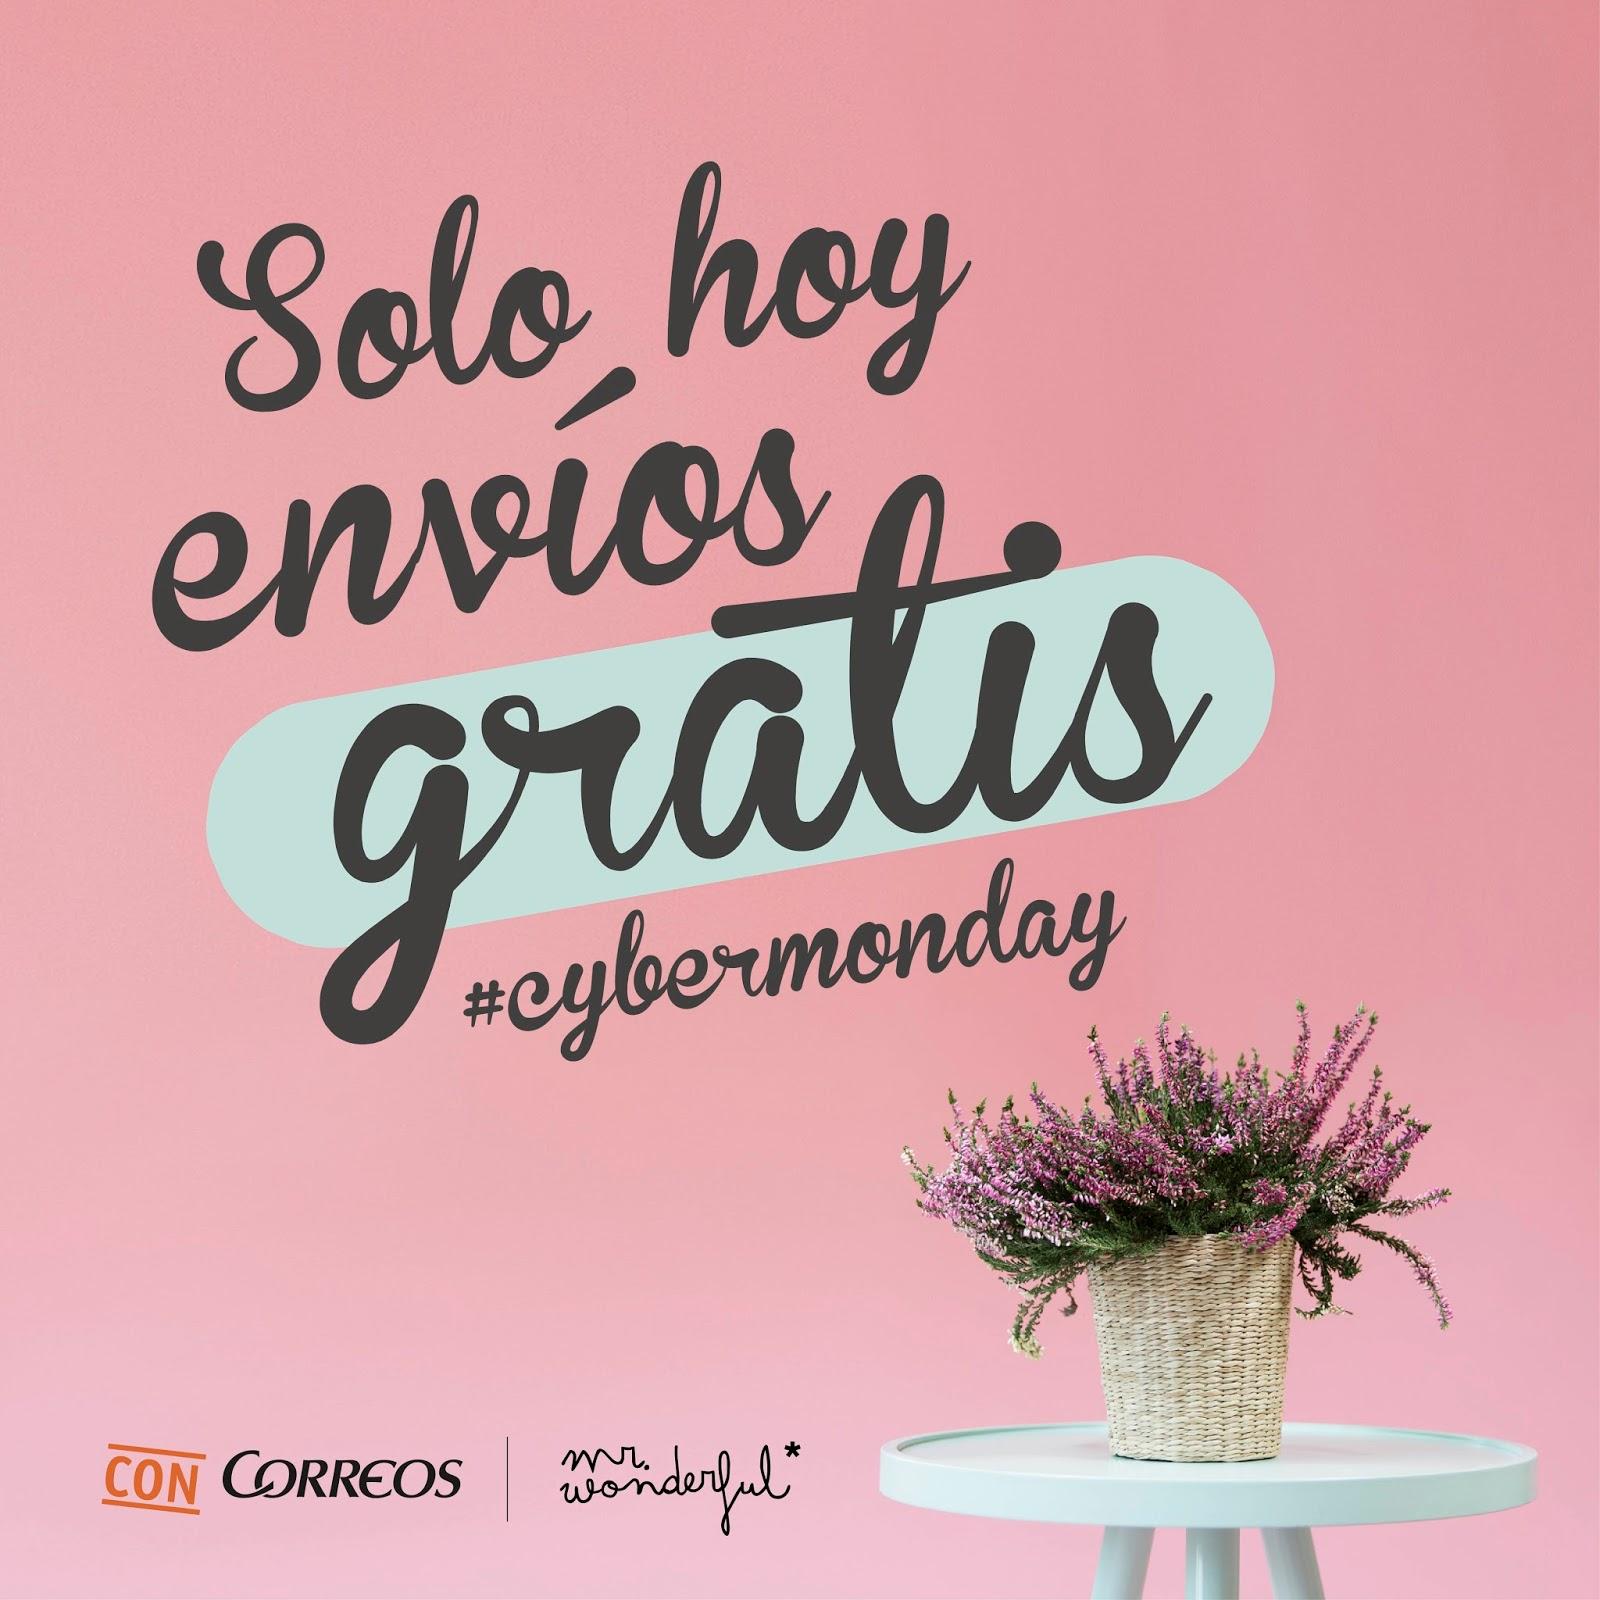 http://www.mrwonderfulshop.es/es/